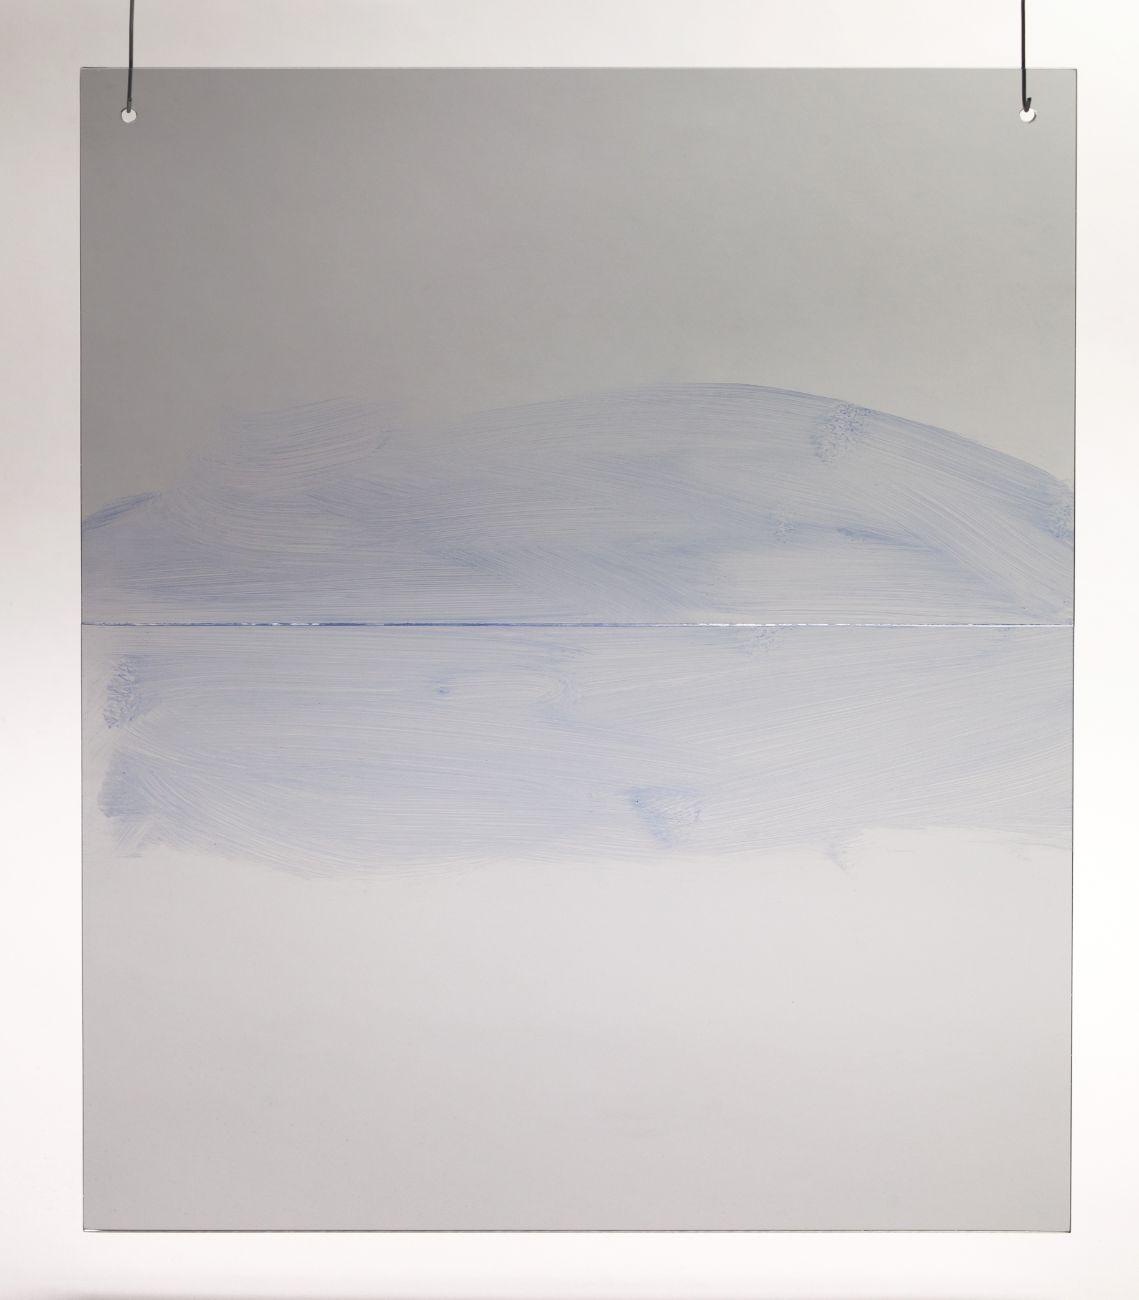 1, 40x50cm, maľba na skle, 2018